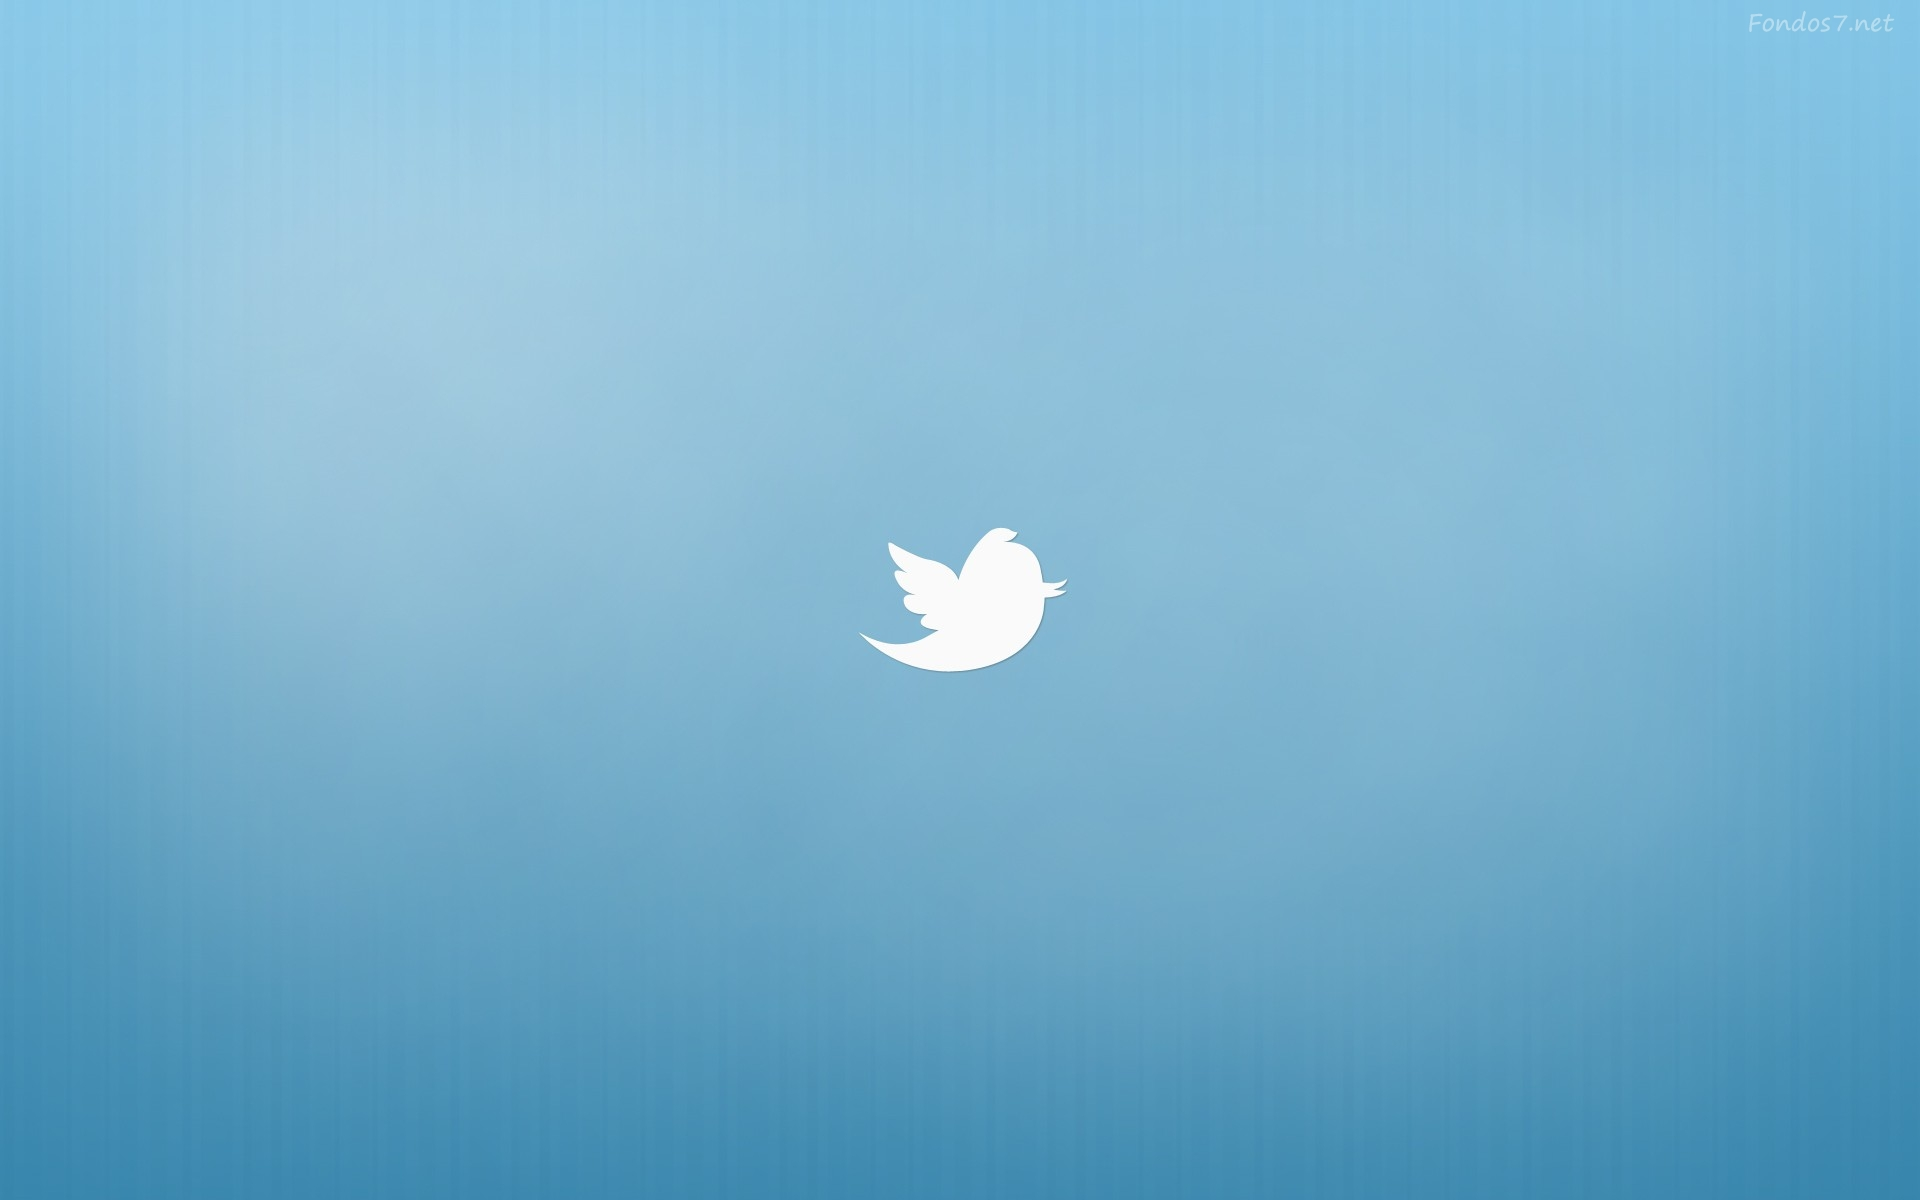 ... Twitter Logo HD Wallpaper-1 ...